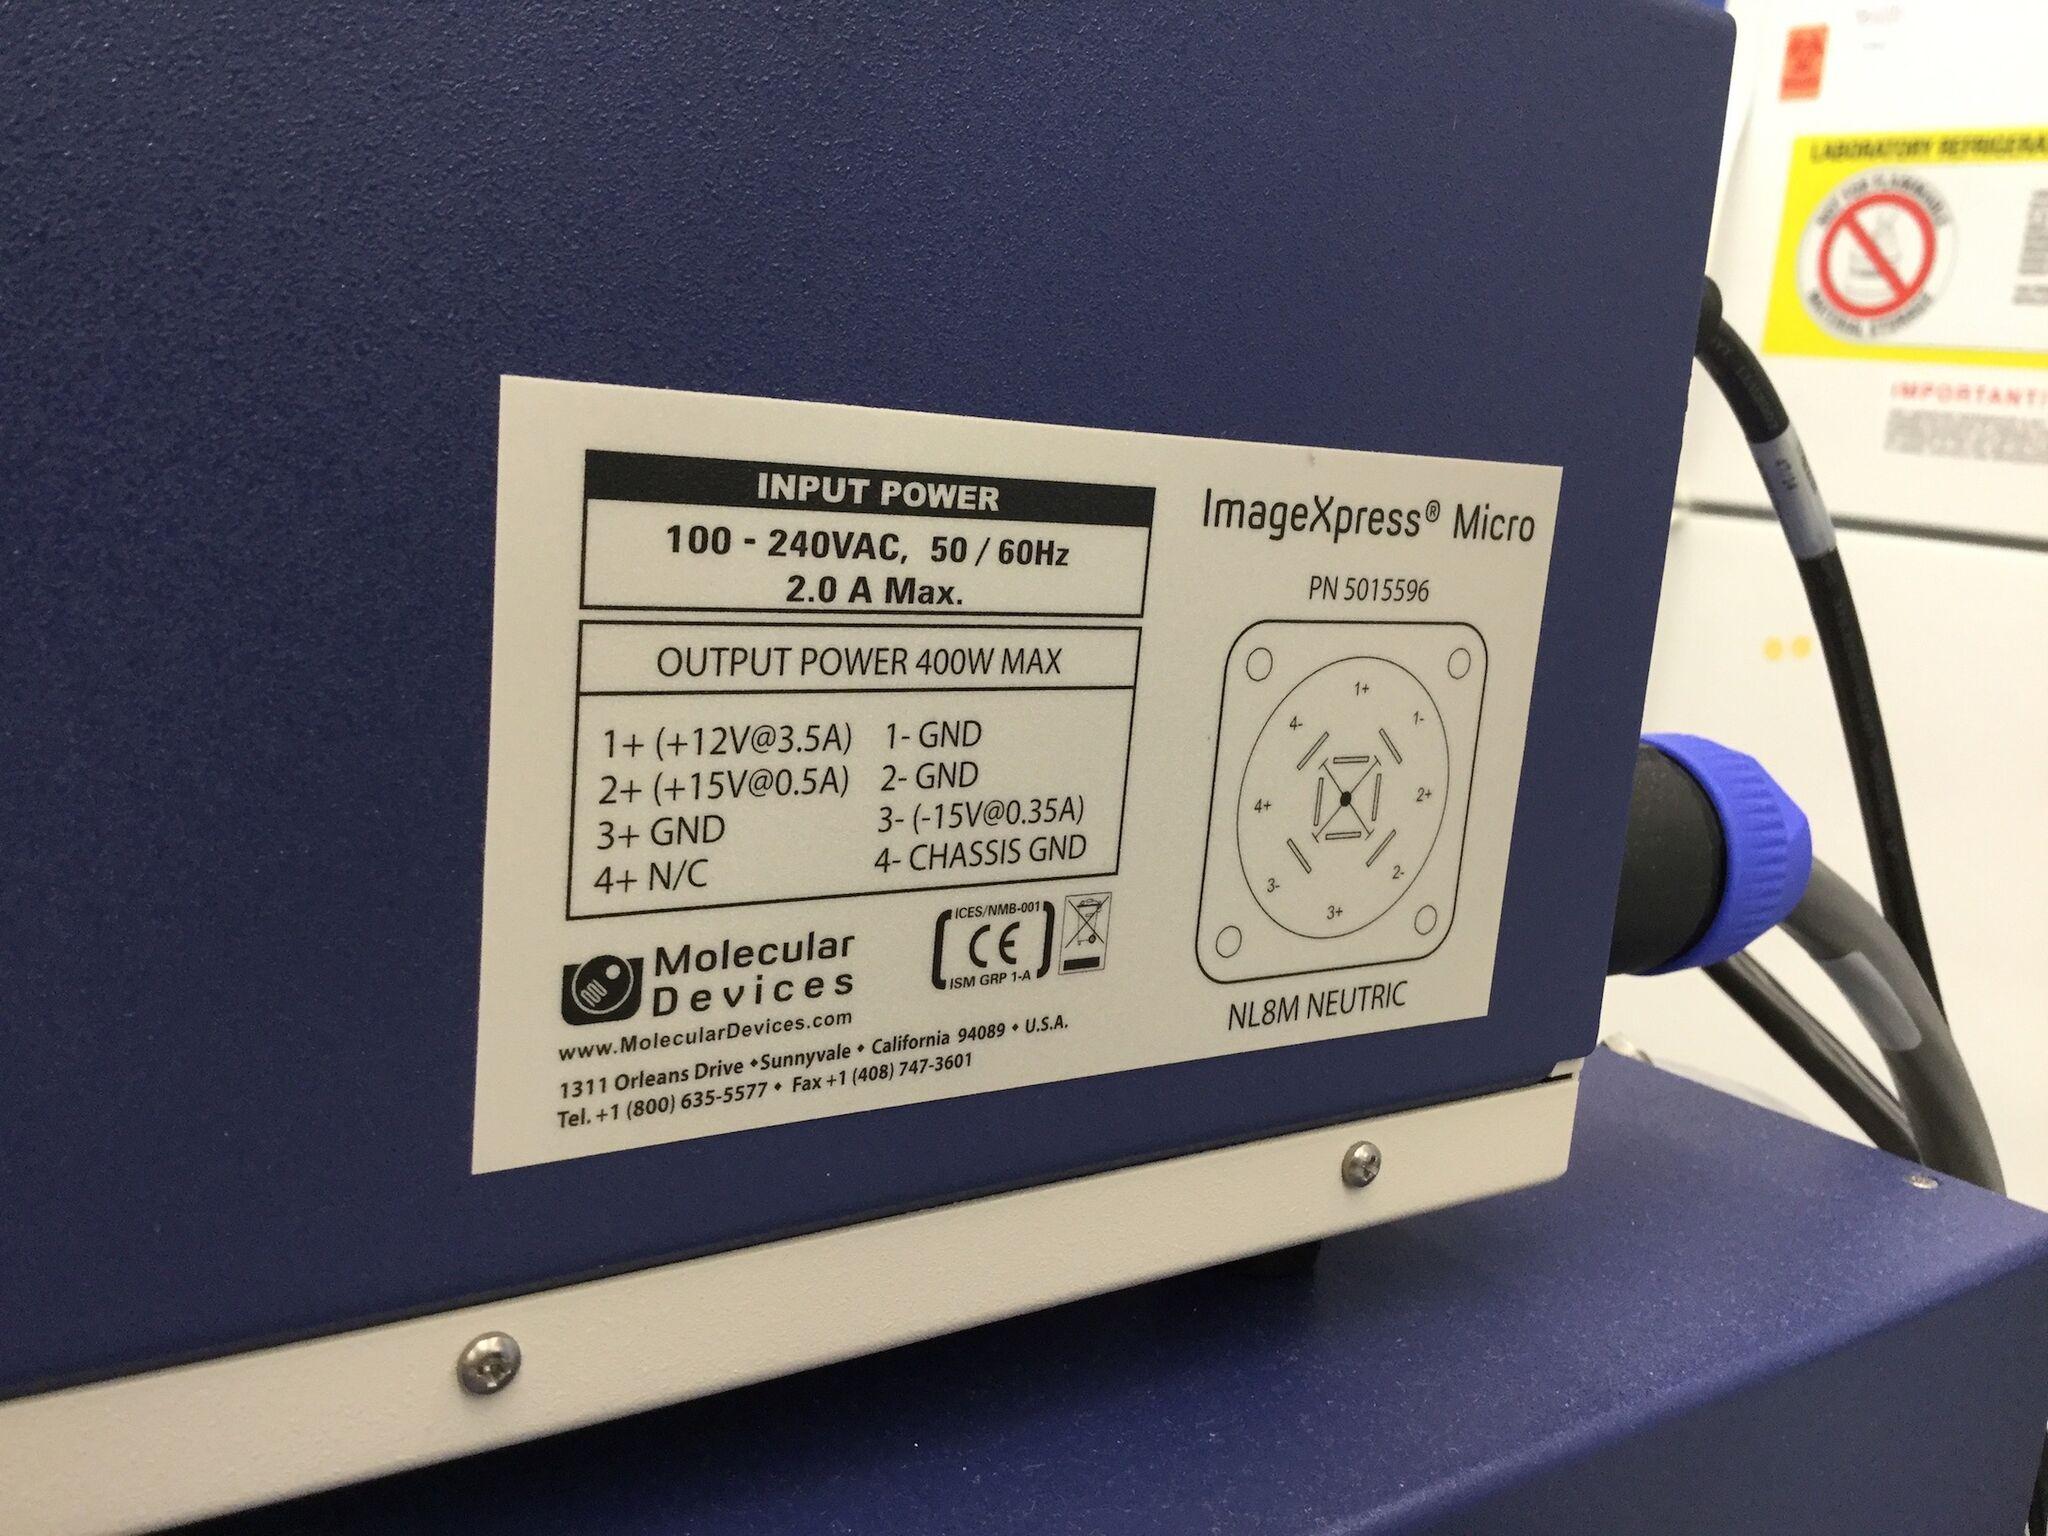 Lot 26 - Molecular Devices ImageXpress Micro XLS